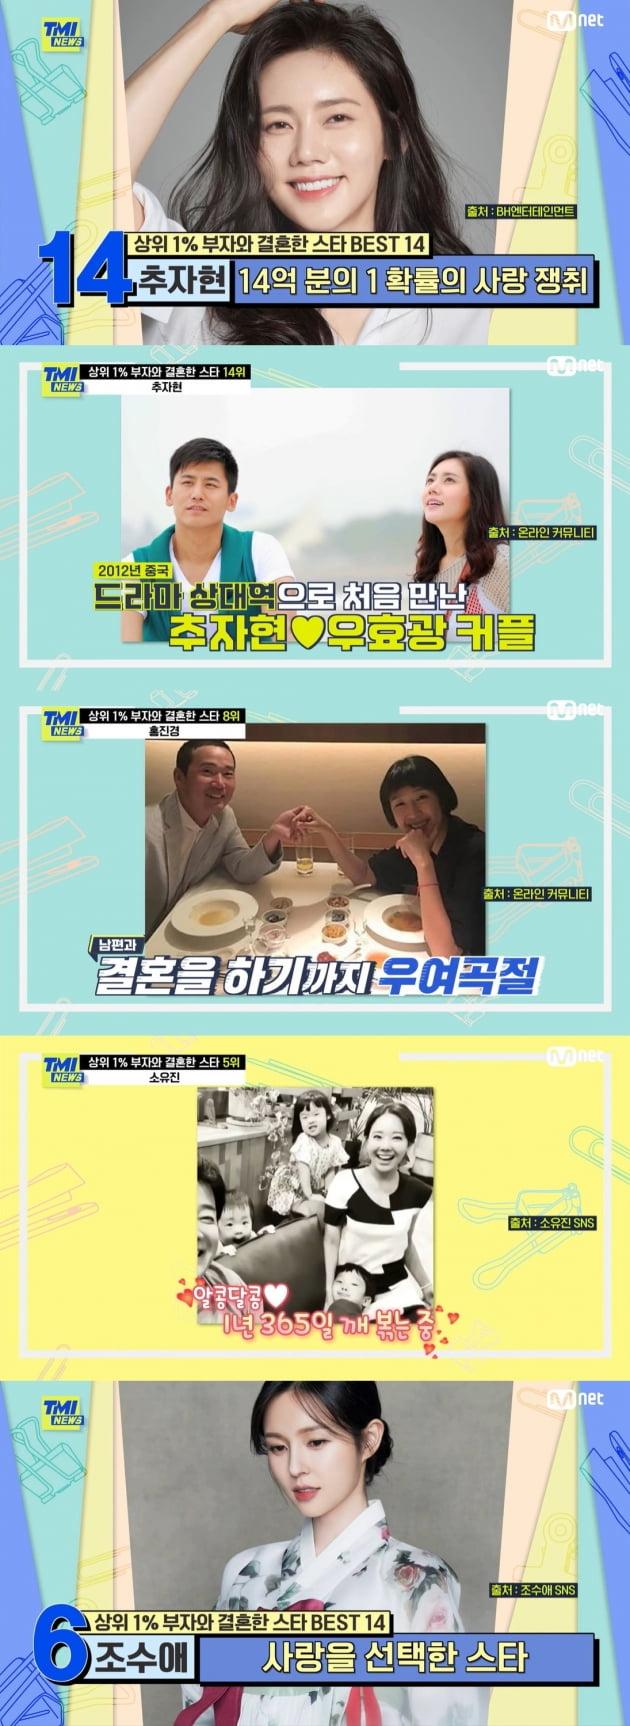 'TMI 뉴스' 상위 1% 부자와 결혼한 스타/ 사진=Mnet 캡처